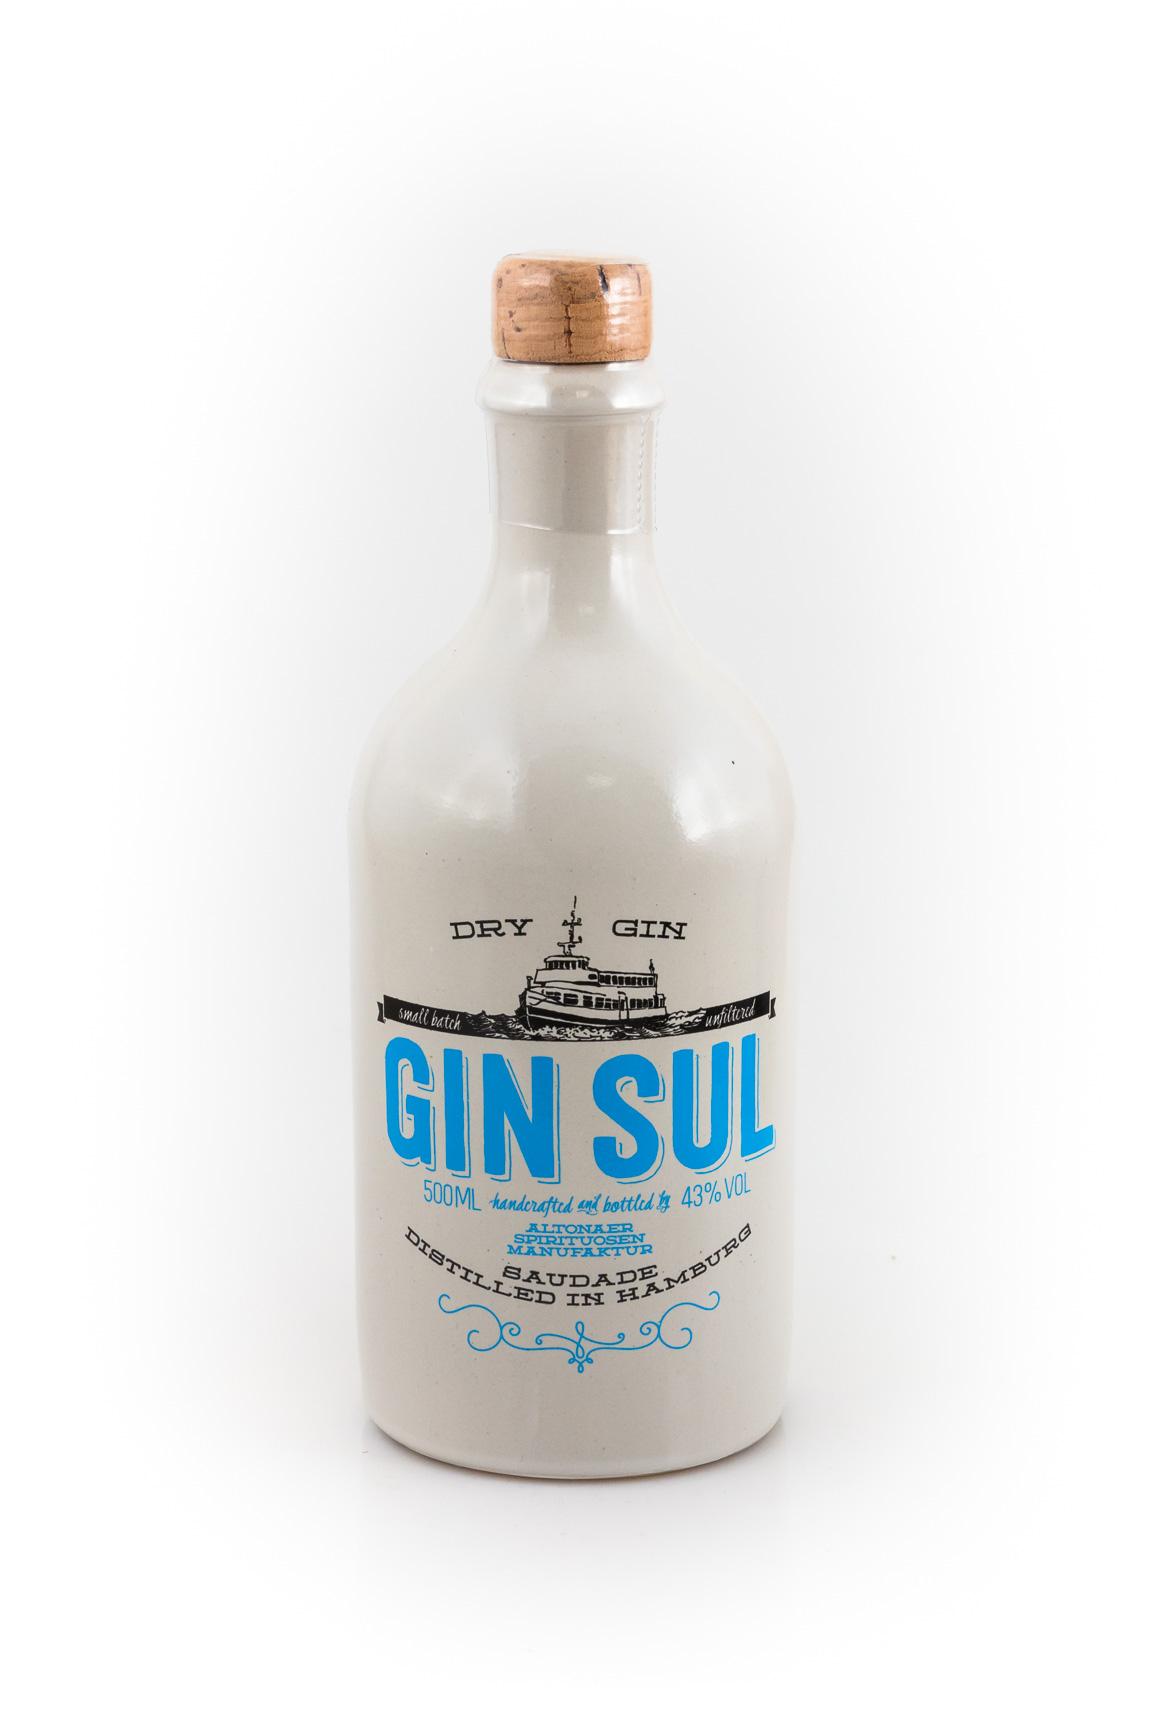 gin sul dry gin handcrafted 0 5l kaufen ab 35 27 eur im. Black Bedroom Furniture Sets. Home Design Ideas